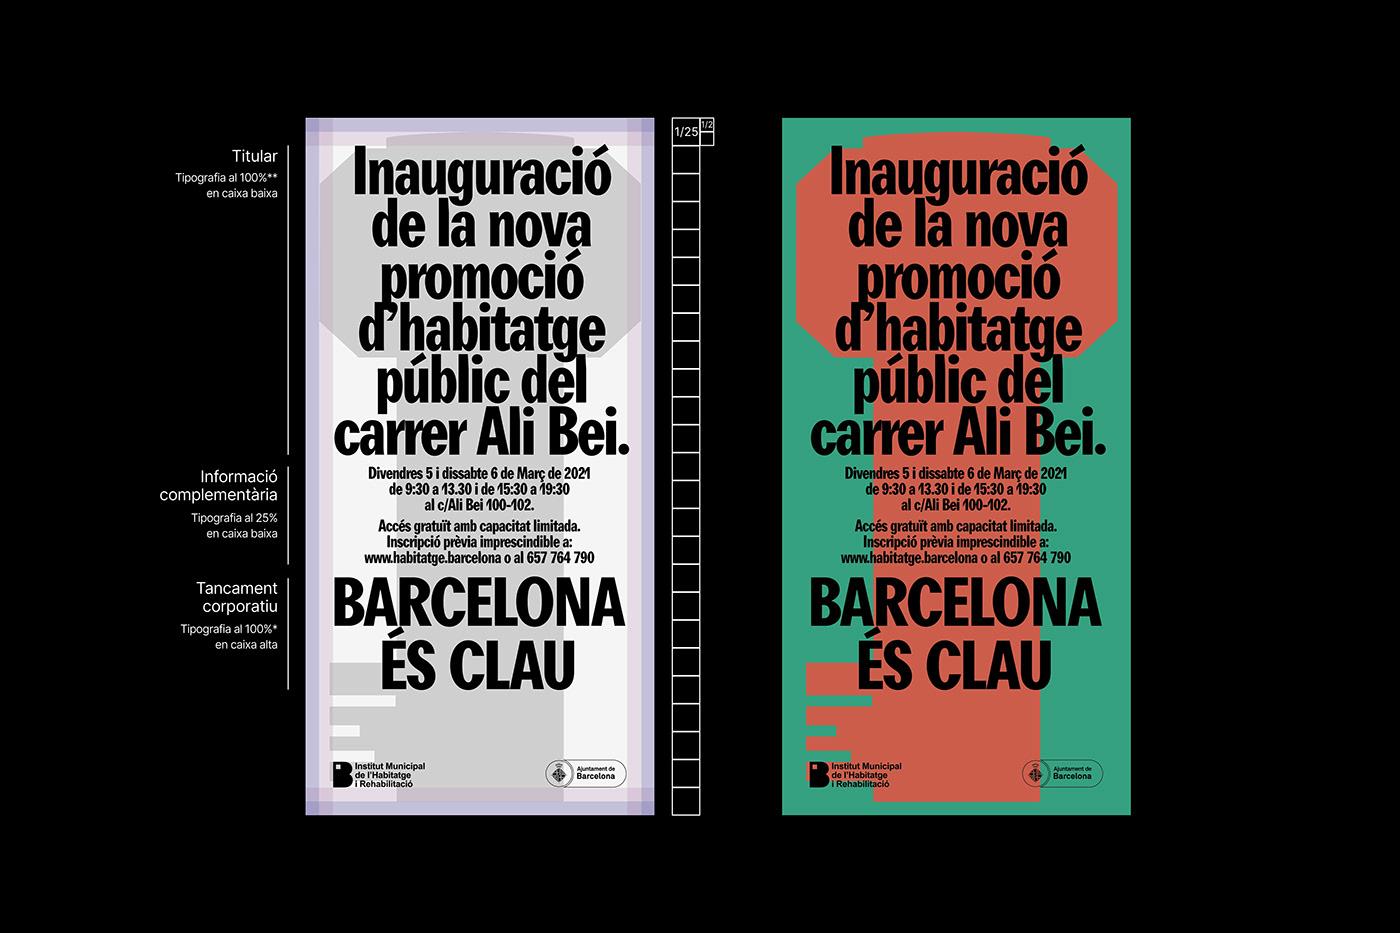 barcelona branding  barcelona city council city colors Graphic code key visual identity visual system